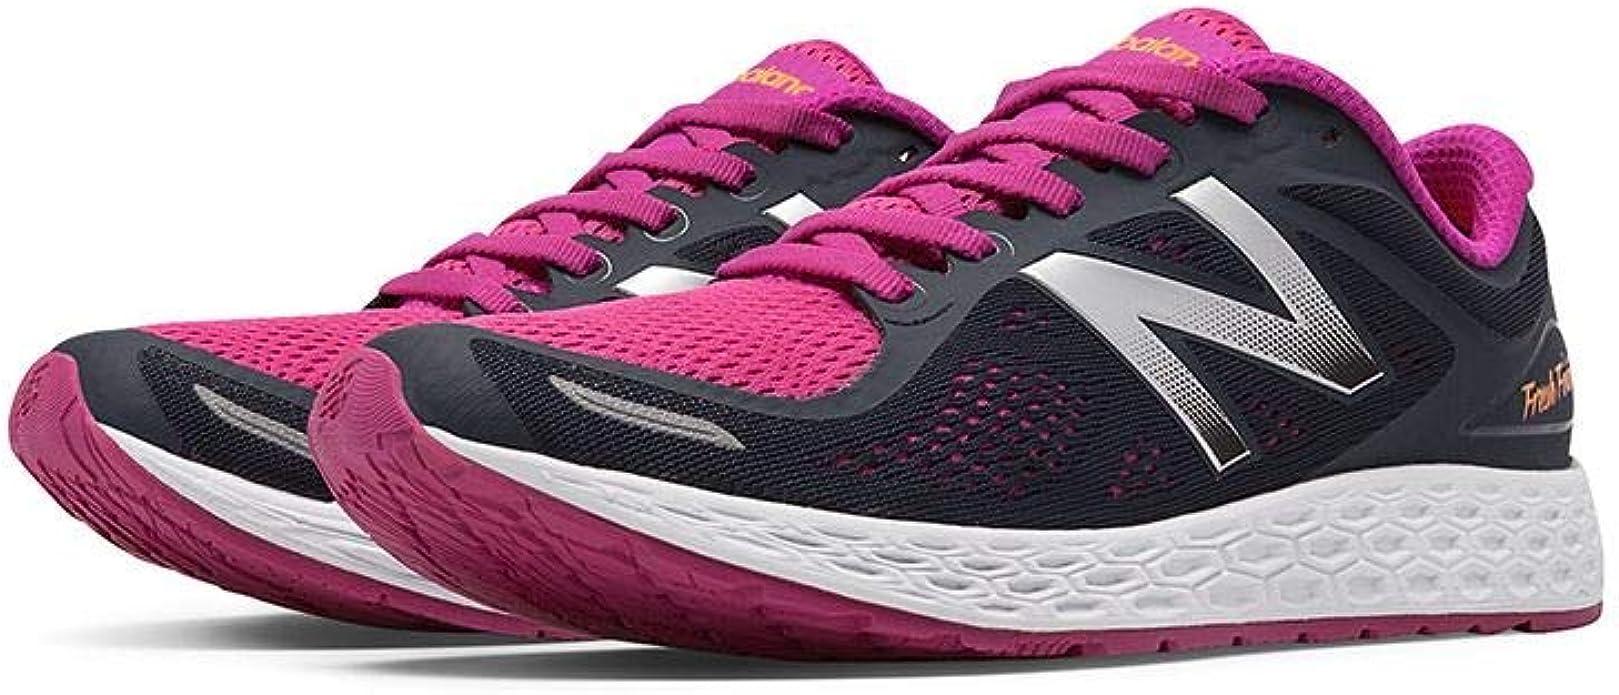 New Balance Wzantpb2 - Zapatillas de running Mujer, Fucsia / Azul Oscuro, 36: Amazon.es: Zapatos y complementos